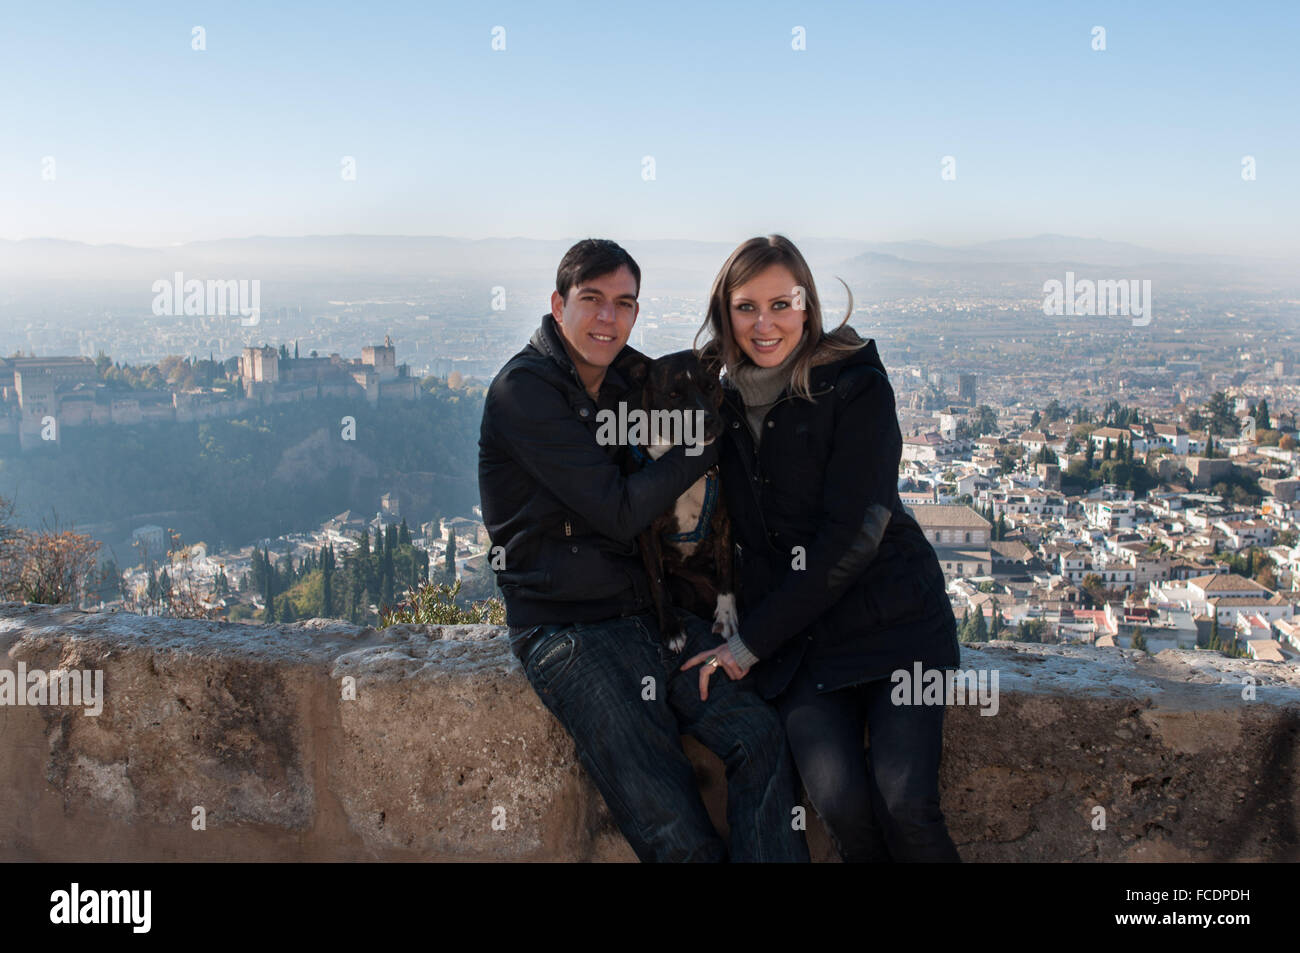 Portrait Of Heterosexual Couple Against Cityscape - Stock Image